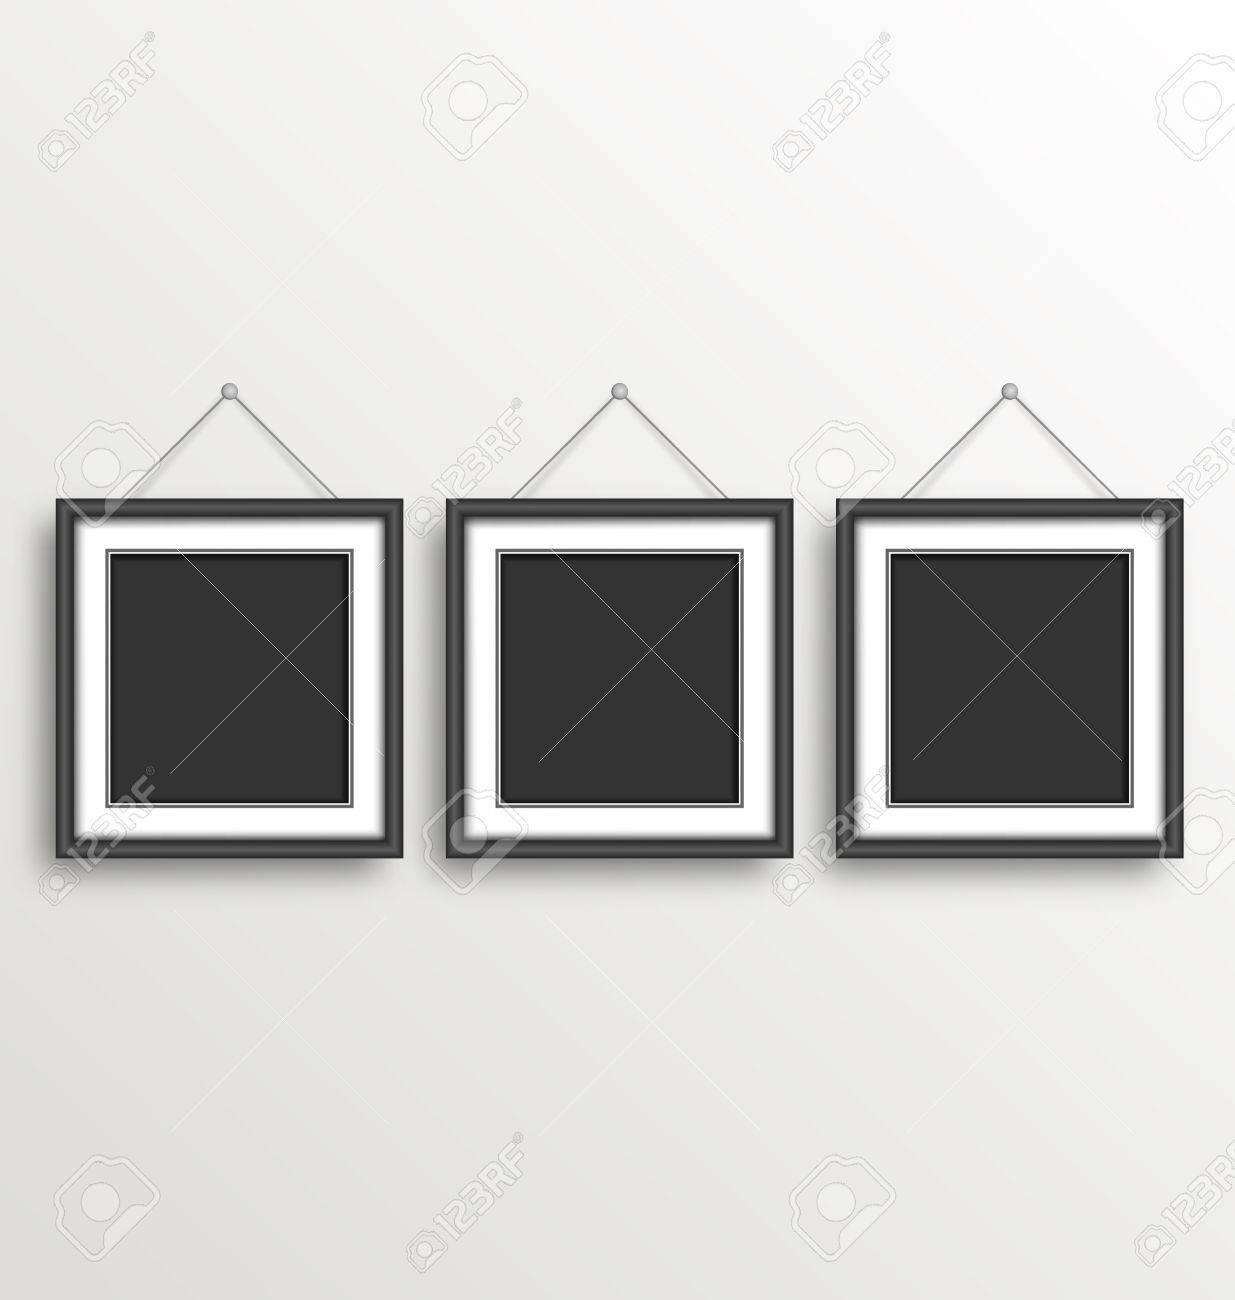 Three black simple modern blank frames on grayscale background three black simple modern blank frames on grayscale background stock photo 42139630 jeuxipadfo Images